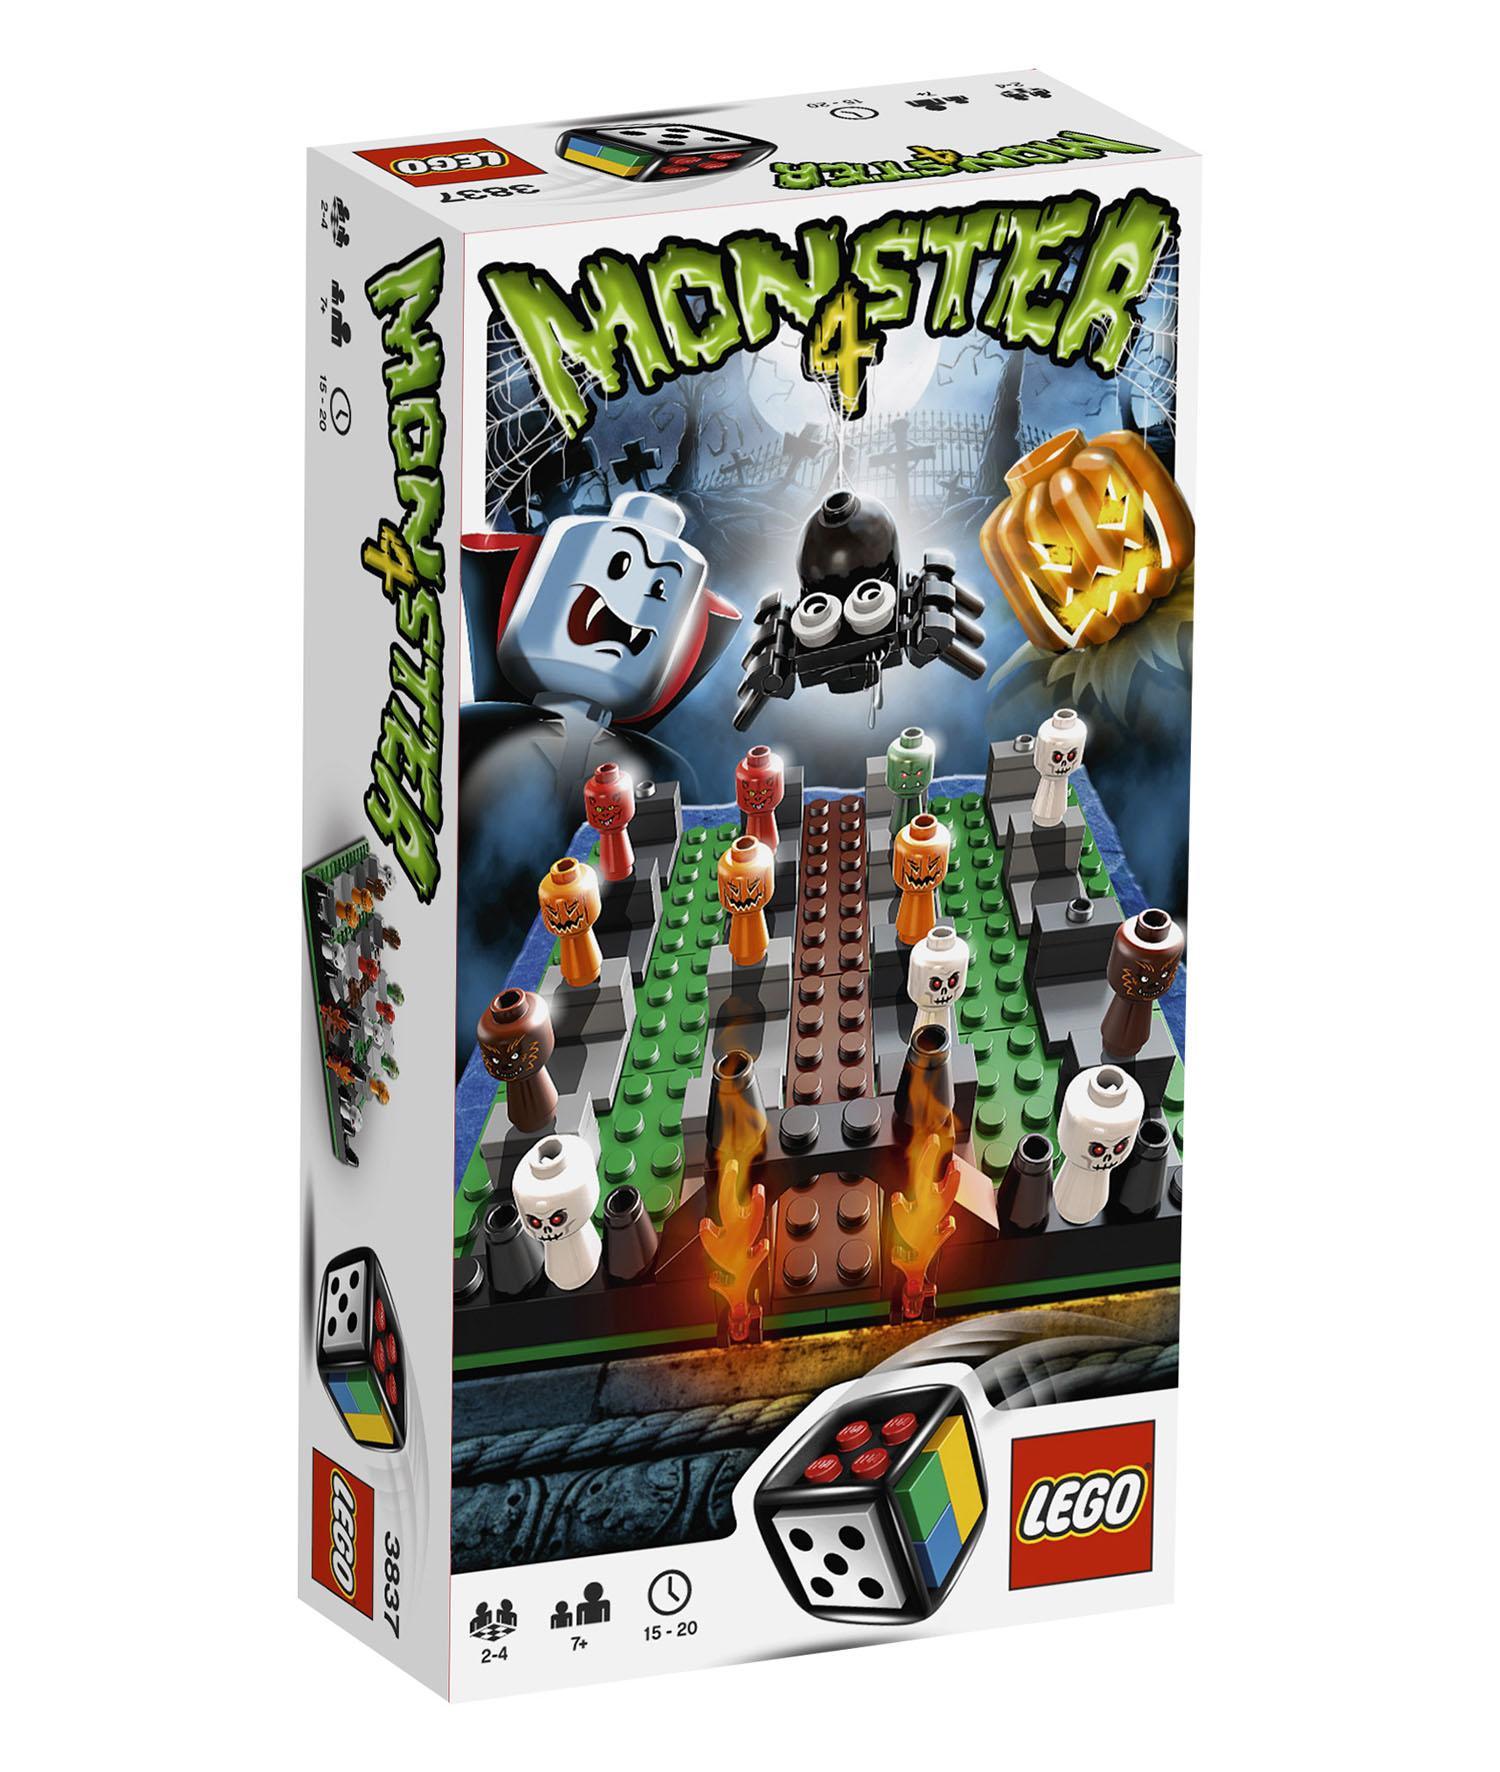 lego jeux de soci t 3837 pas cher monster 4. Black Bedroom Furniture Sets. Home Design Ideas